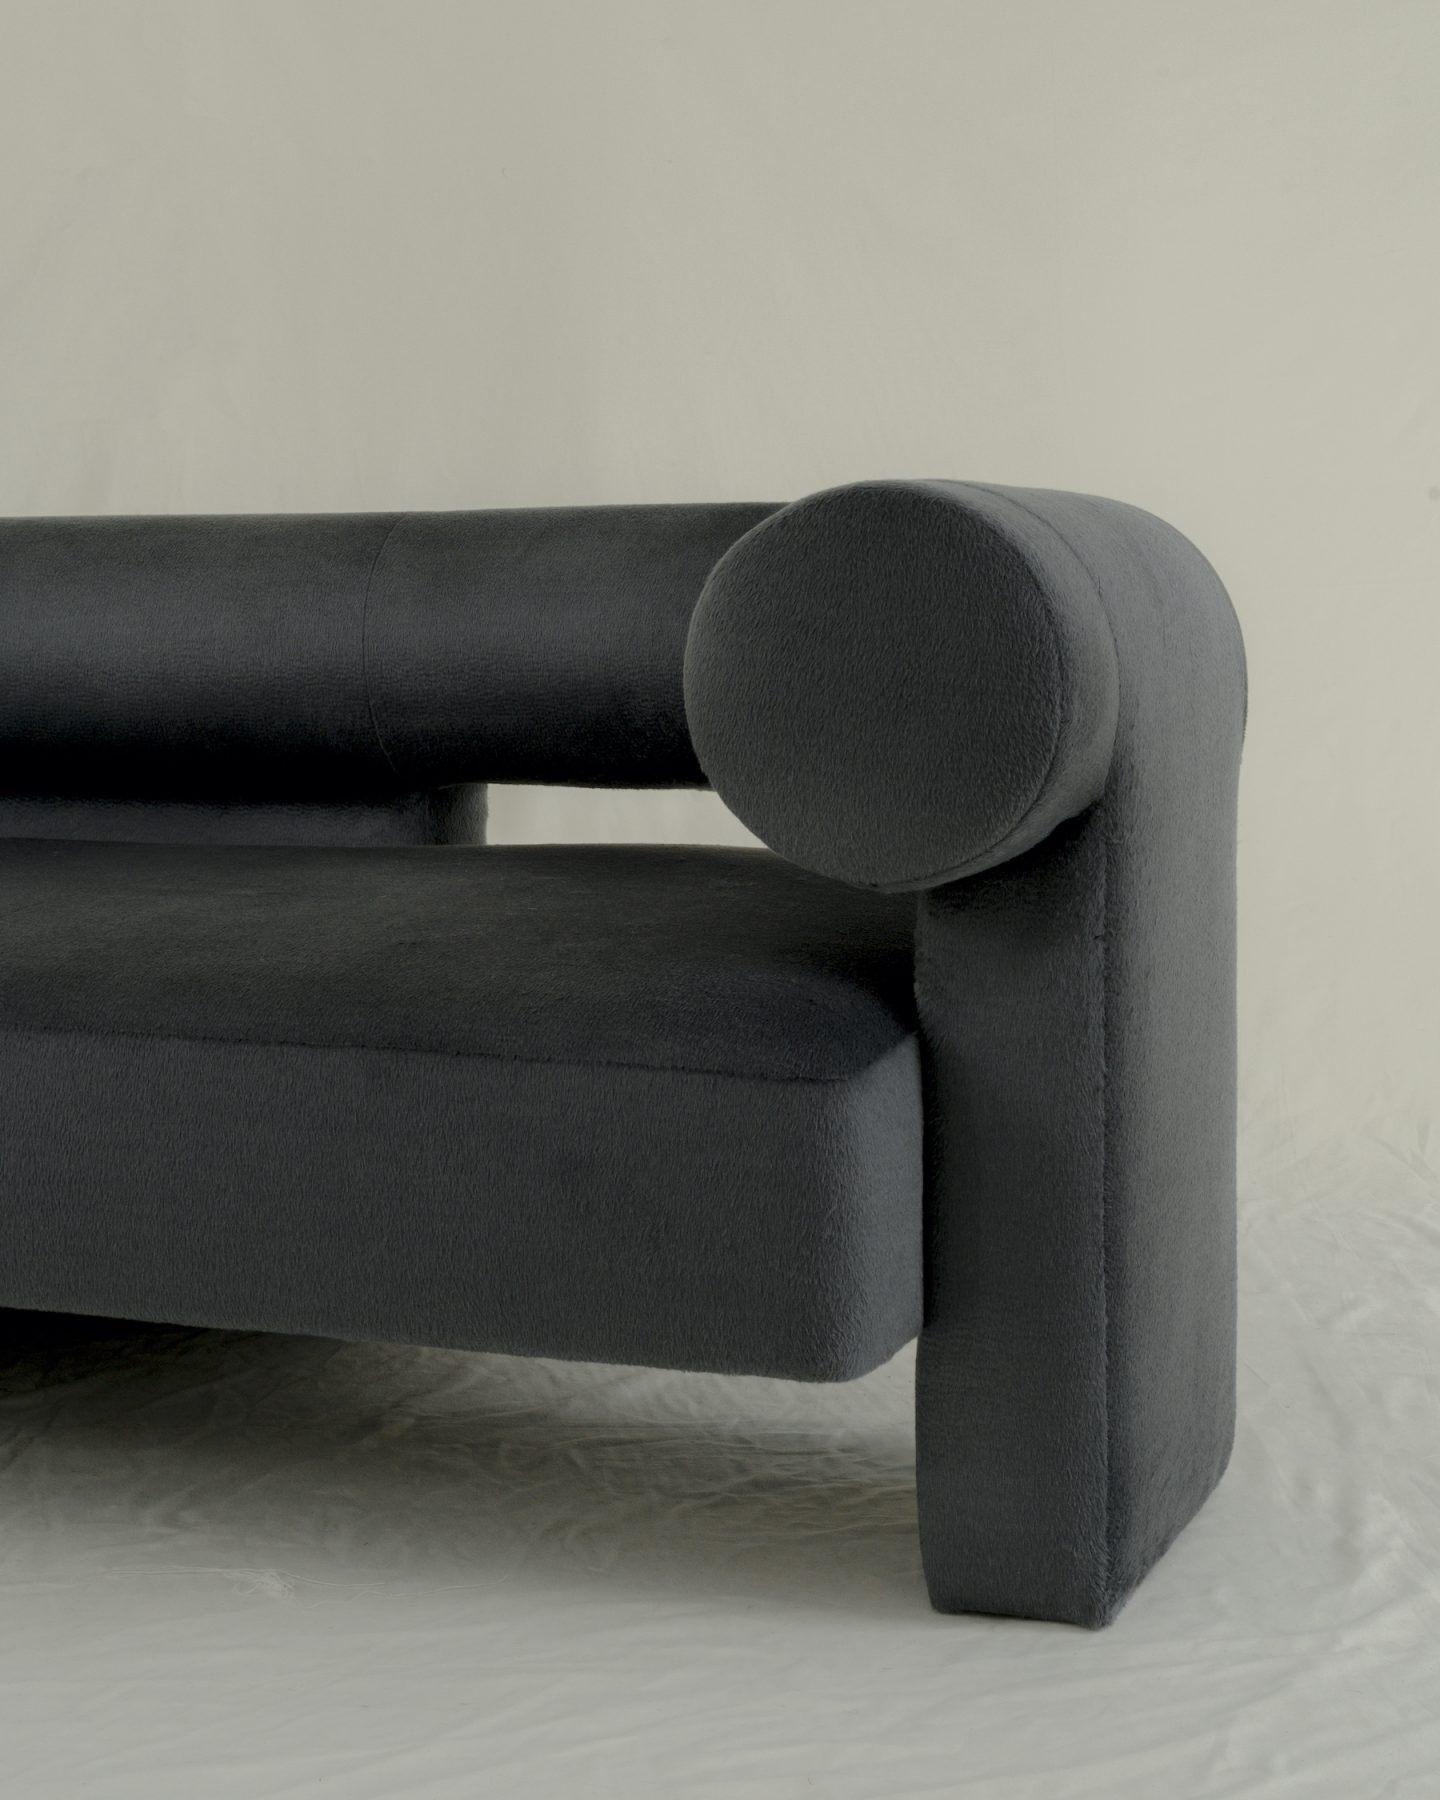 IGNANT-Design-Ian-Felton-Kosa-17